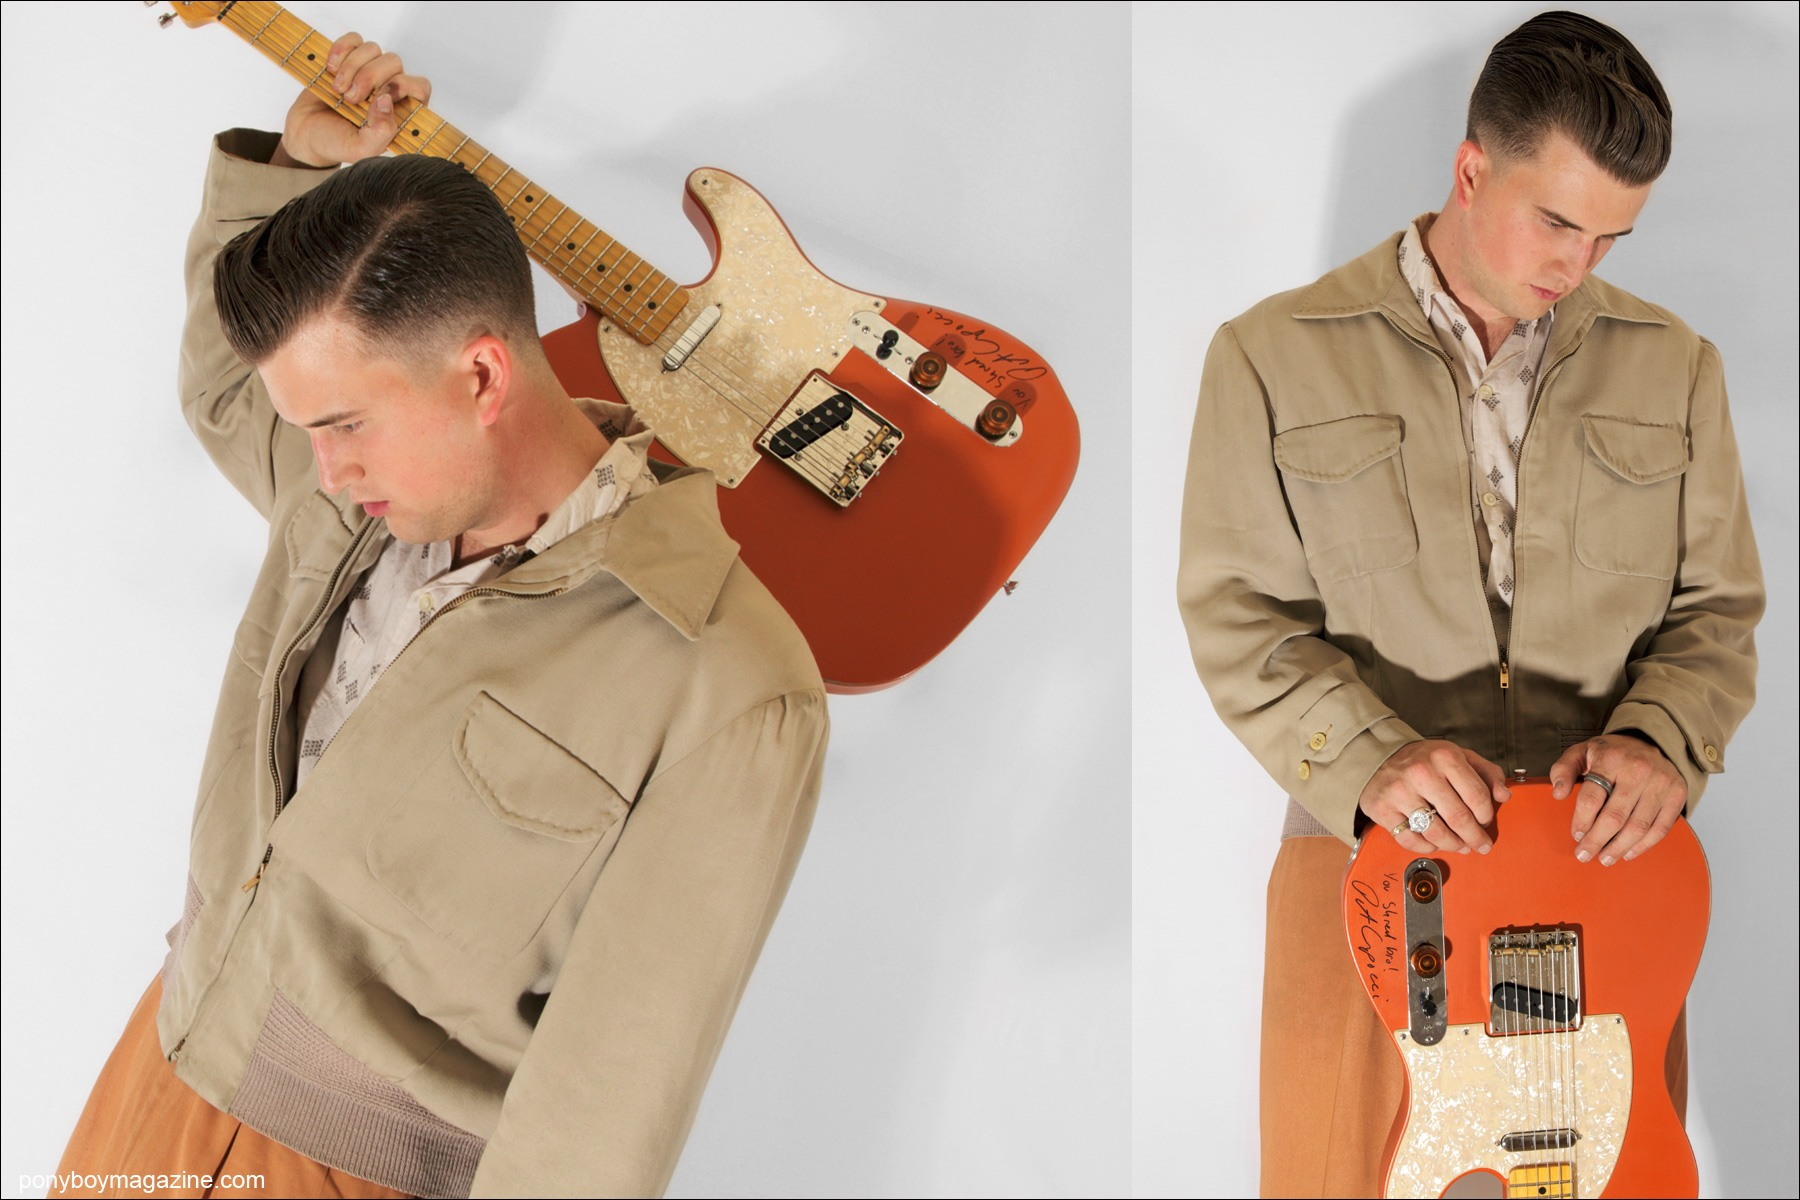 Josh Hi-Fi Sorheim photographed for Ponyboy Magazine by Alexander Thompson.